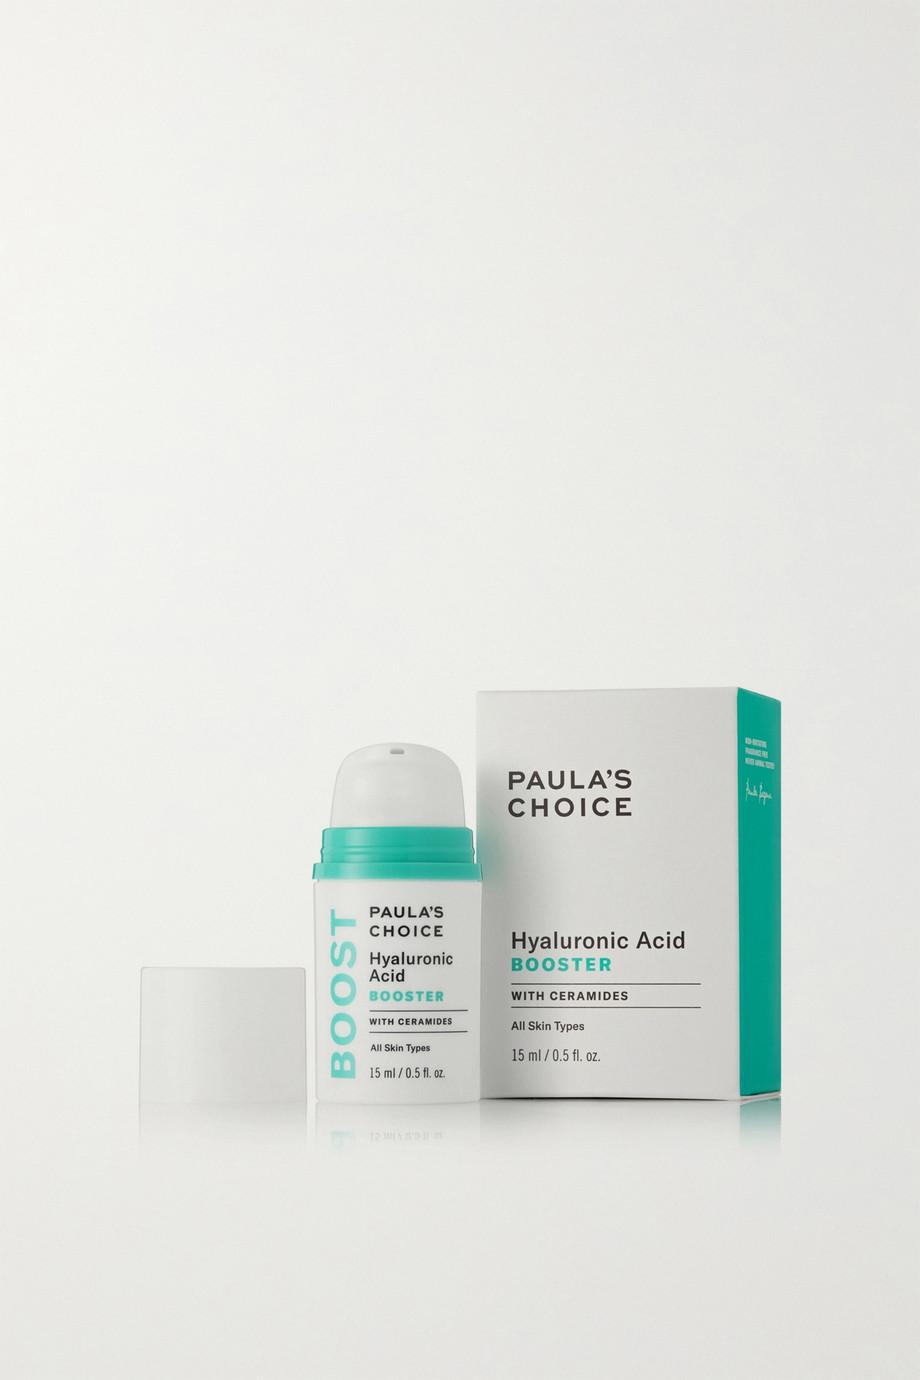 Paula's Choice Hyaluronic Acid Booster, 15 ml – Serum